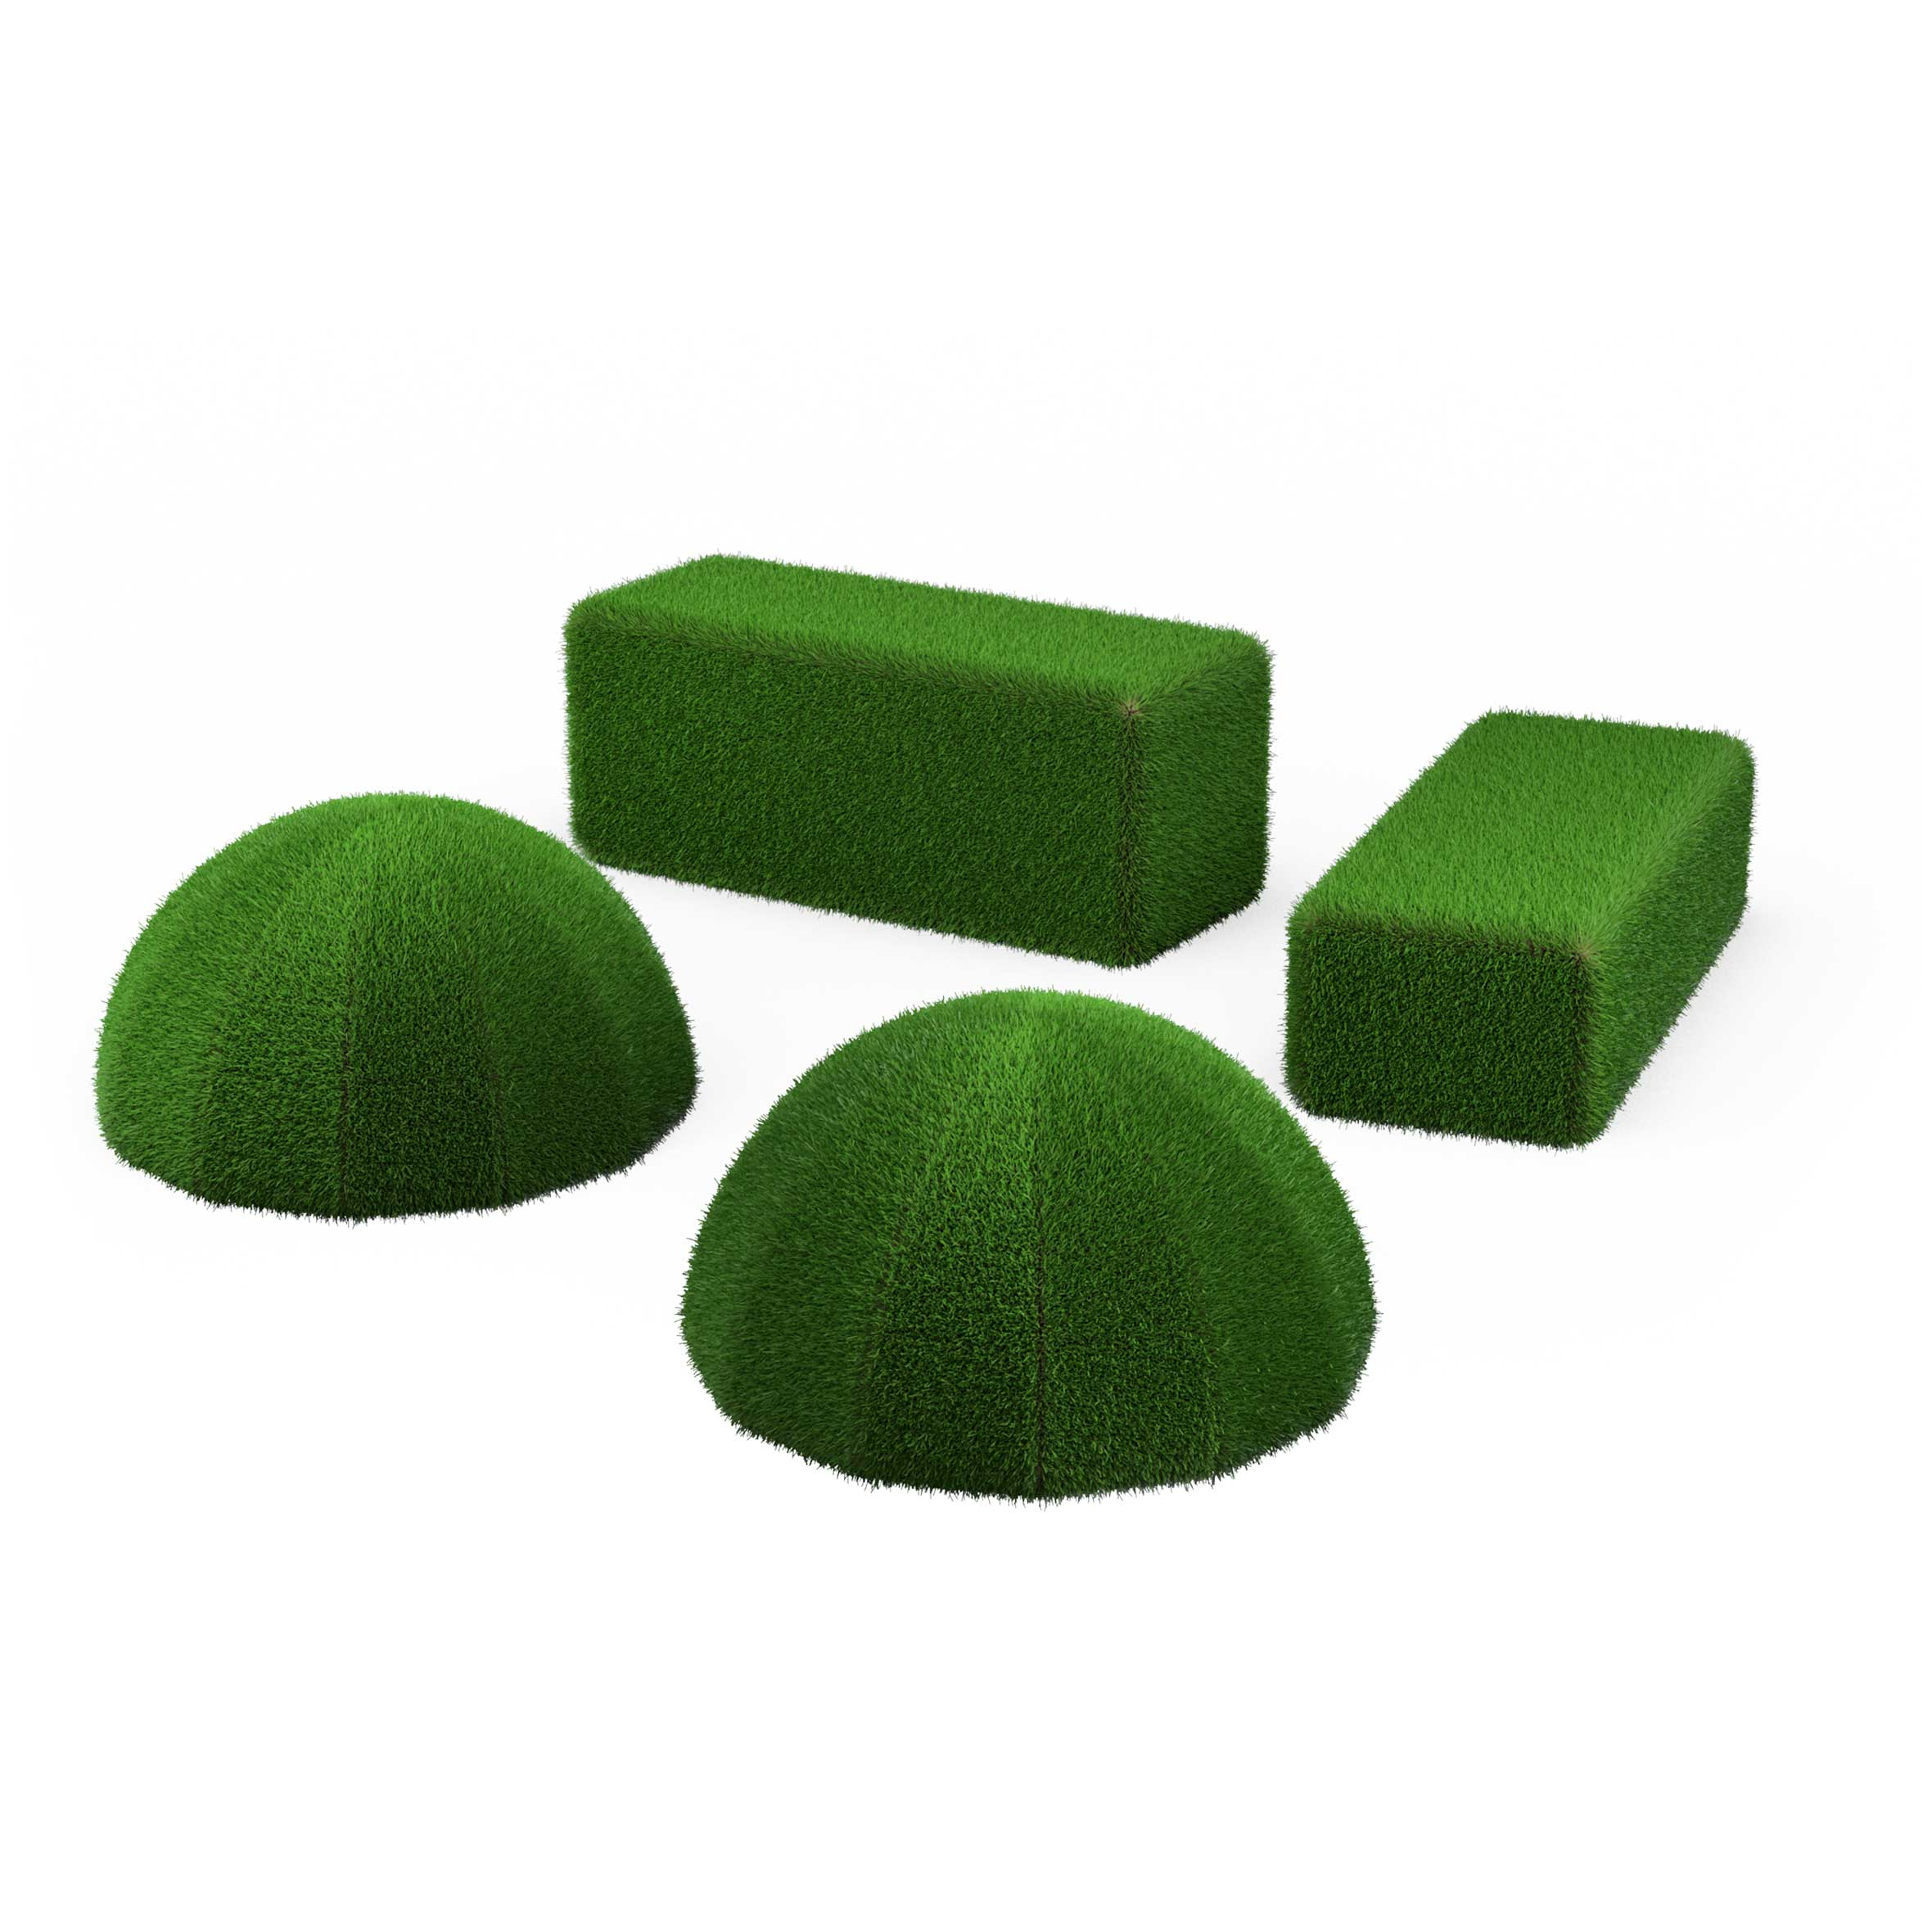 Grass Collection C044 | Beparta Flexible School Furniture